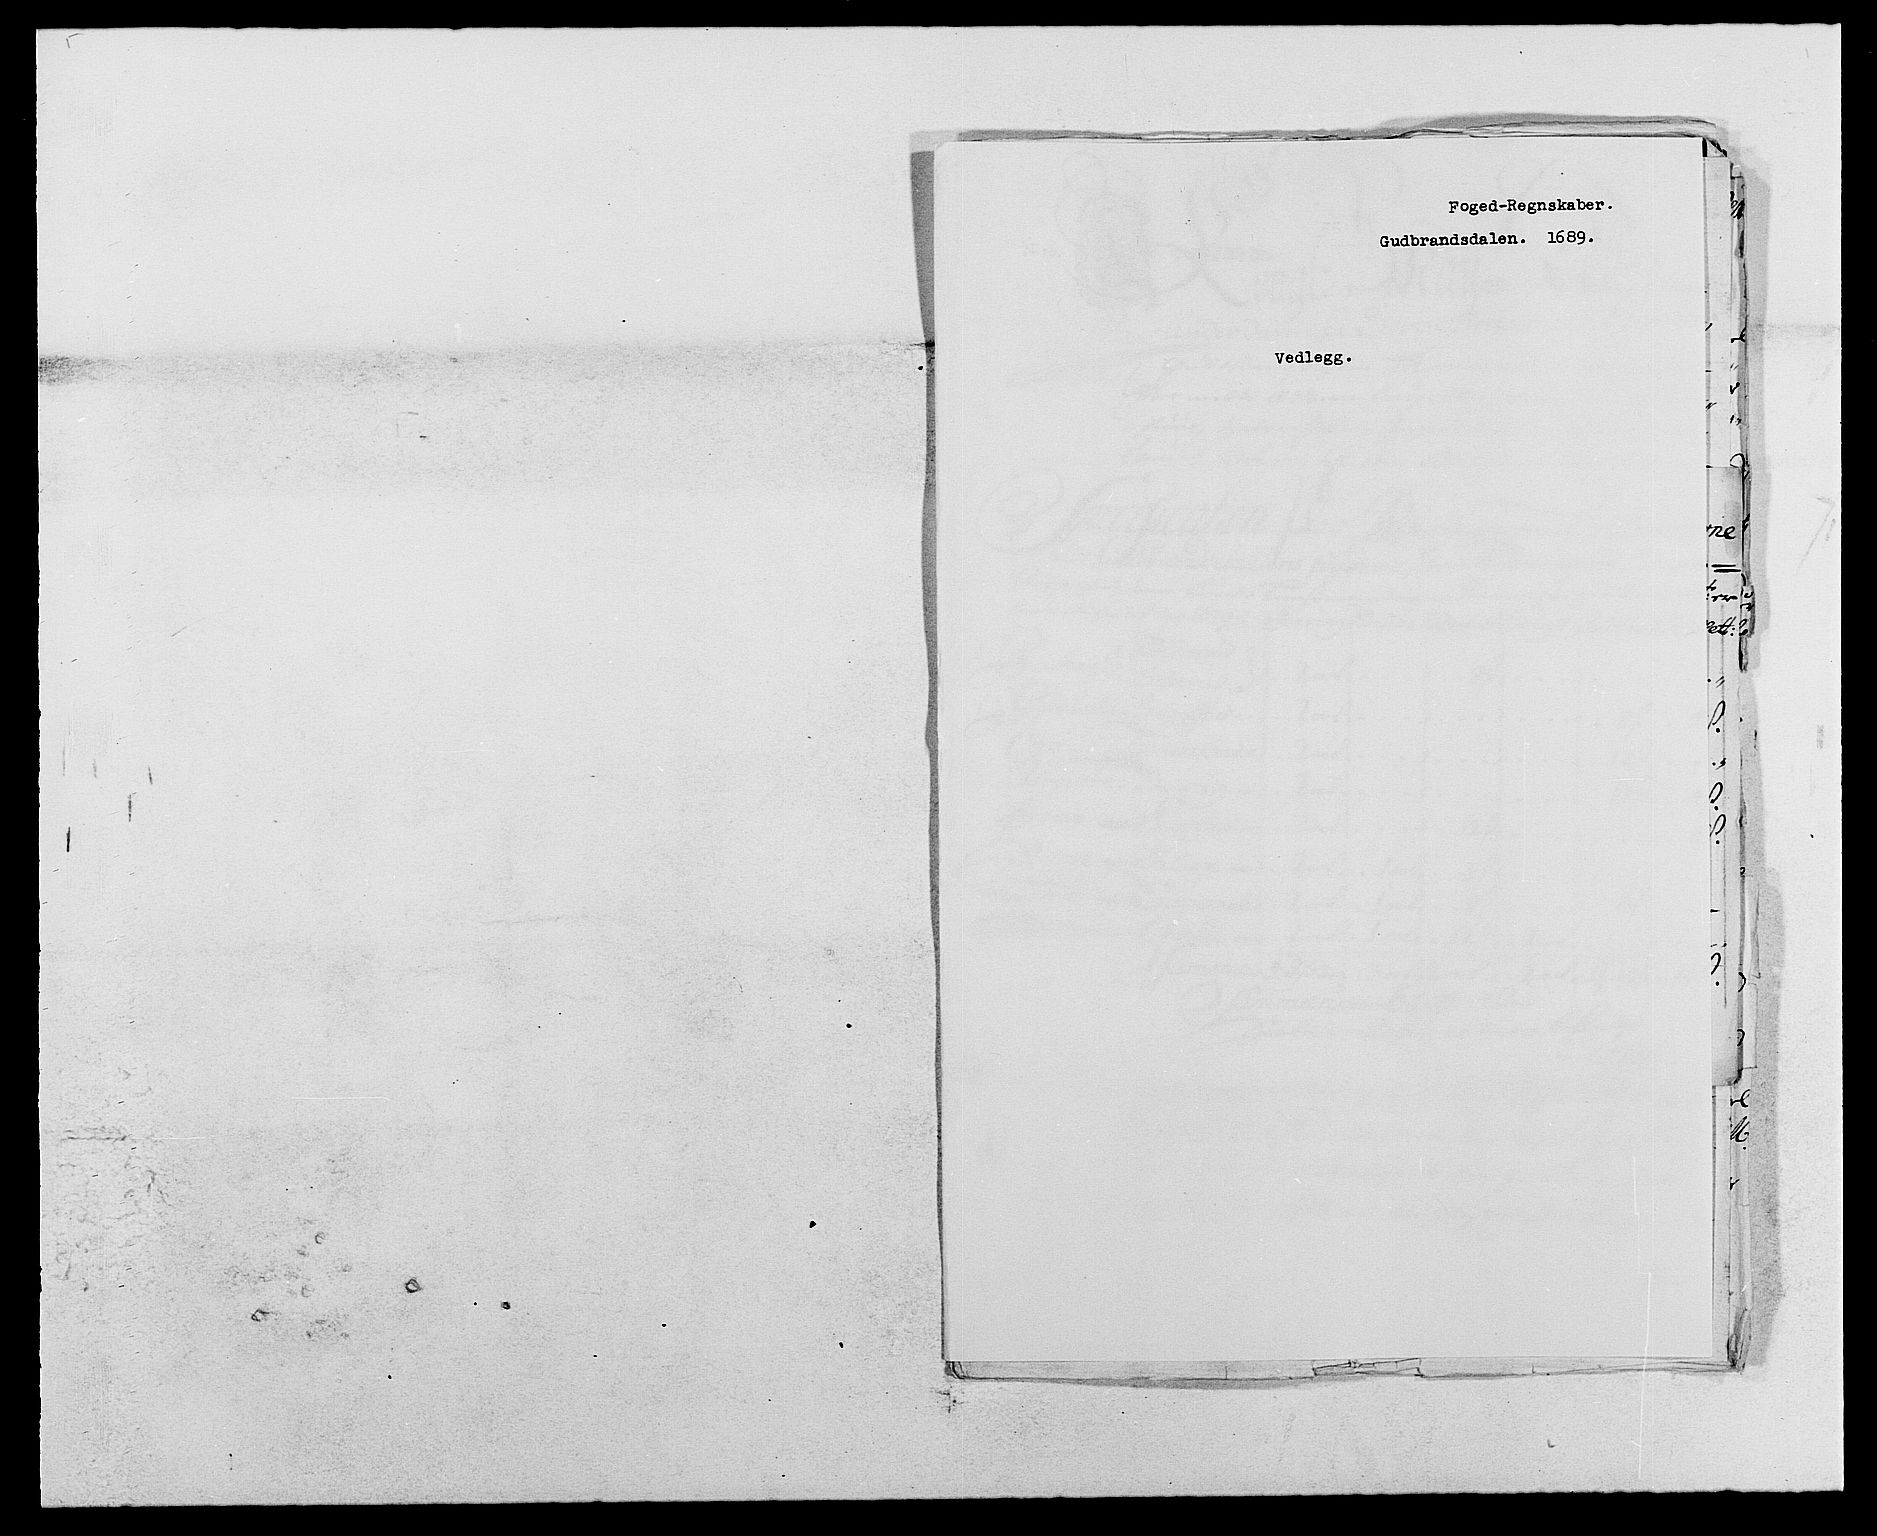 RA, Rentekammeret inntil 1814, Reviderte regnskaper, Fogderegnskap, R17/L1164: Fogderegnskap Gudbrandsdal, 1682-1689, s. 178